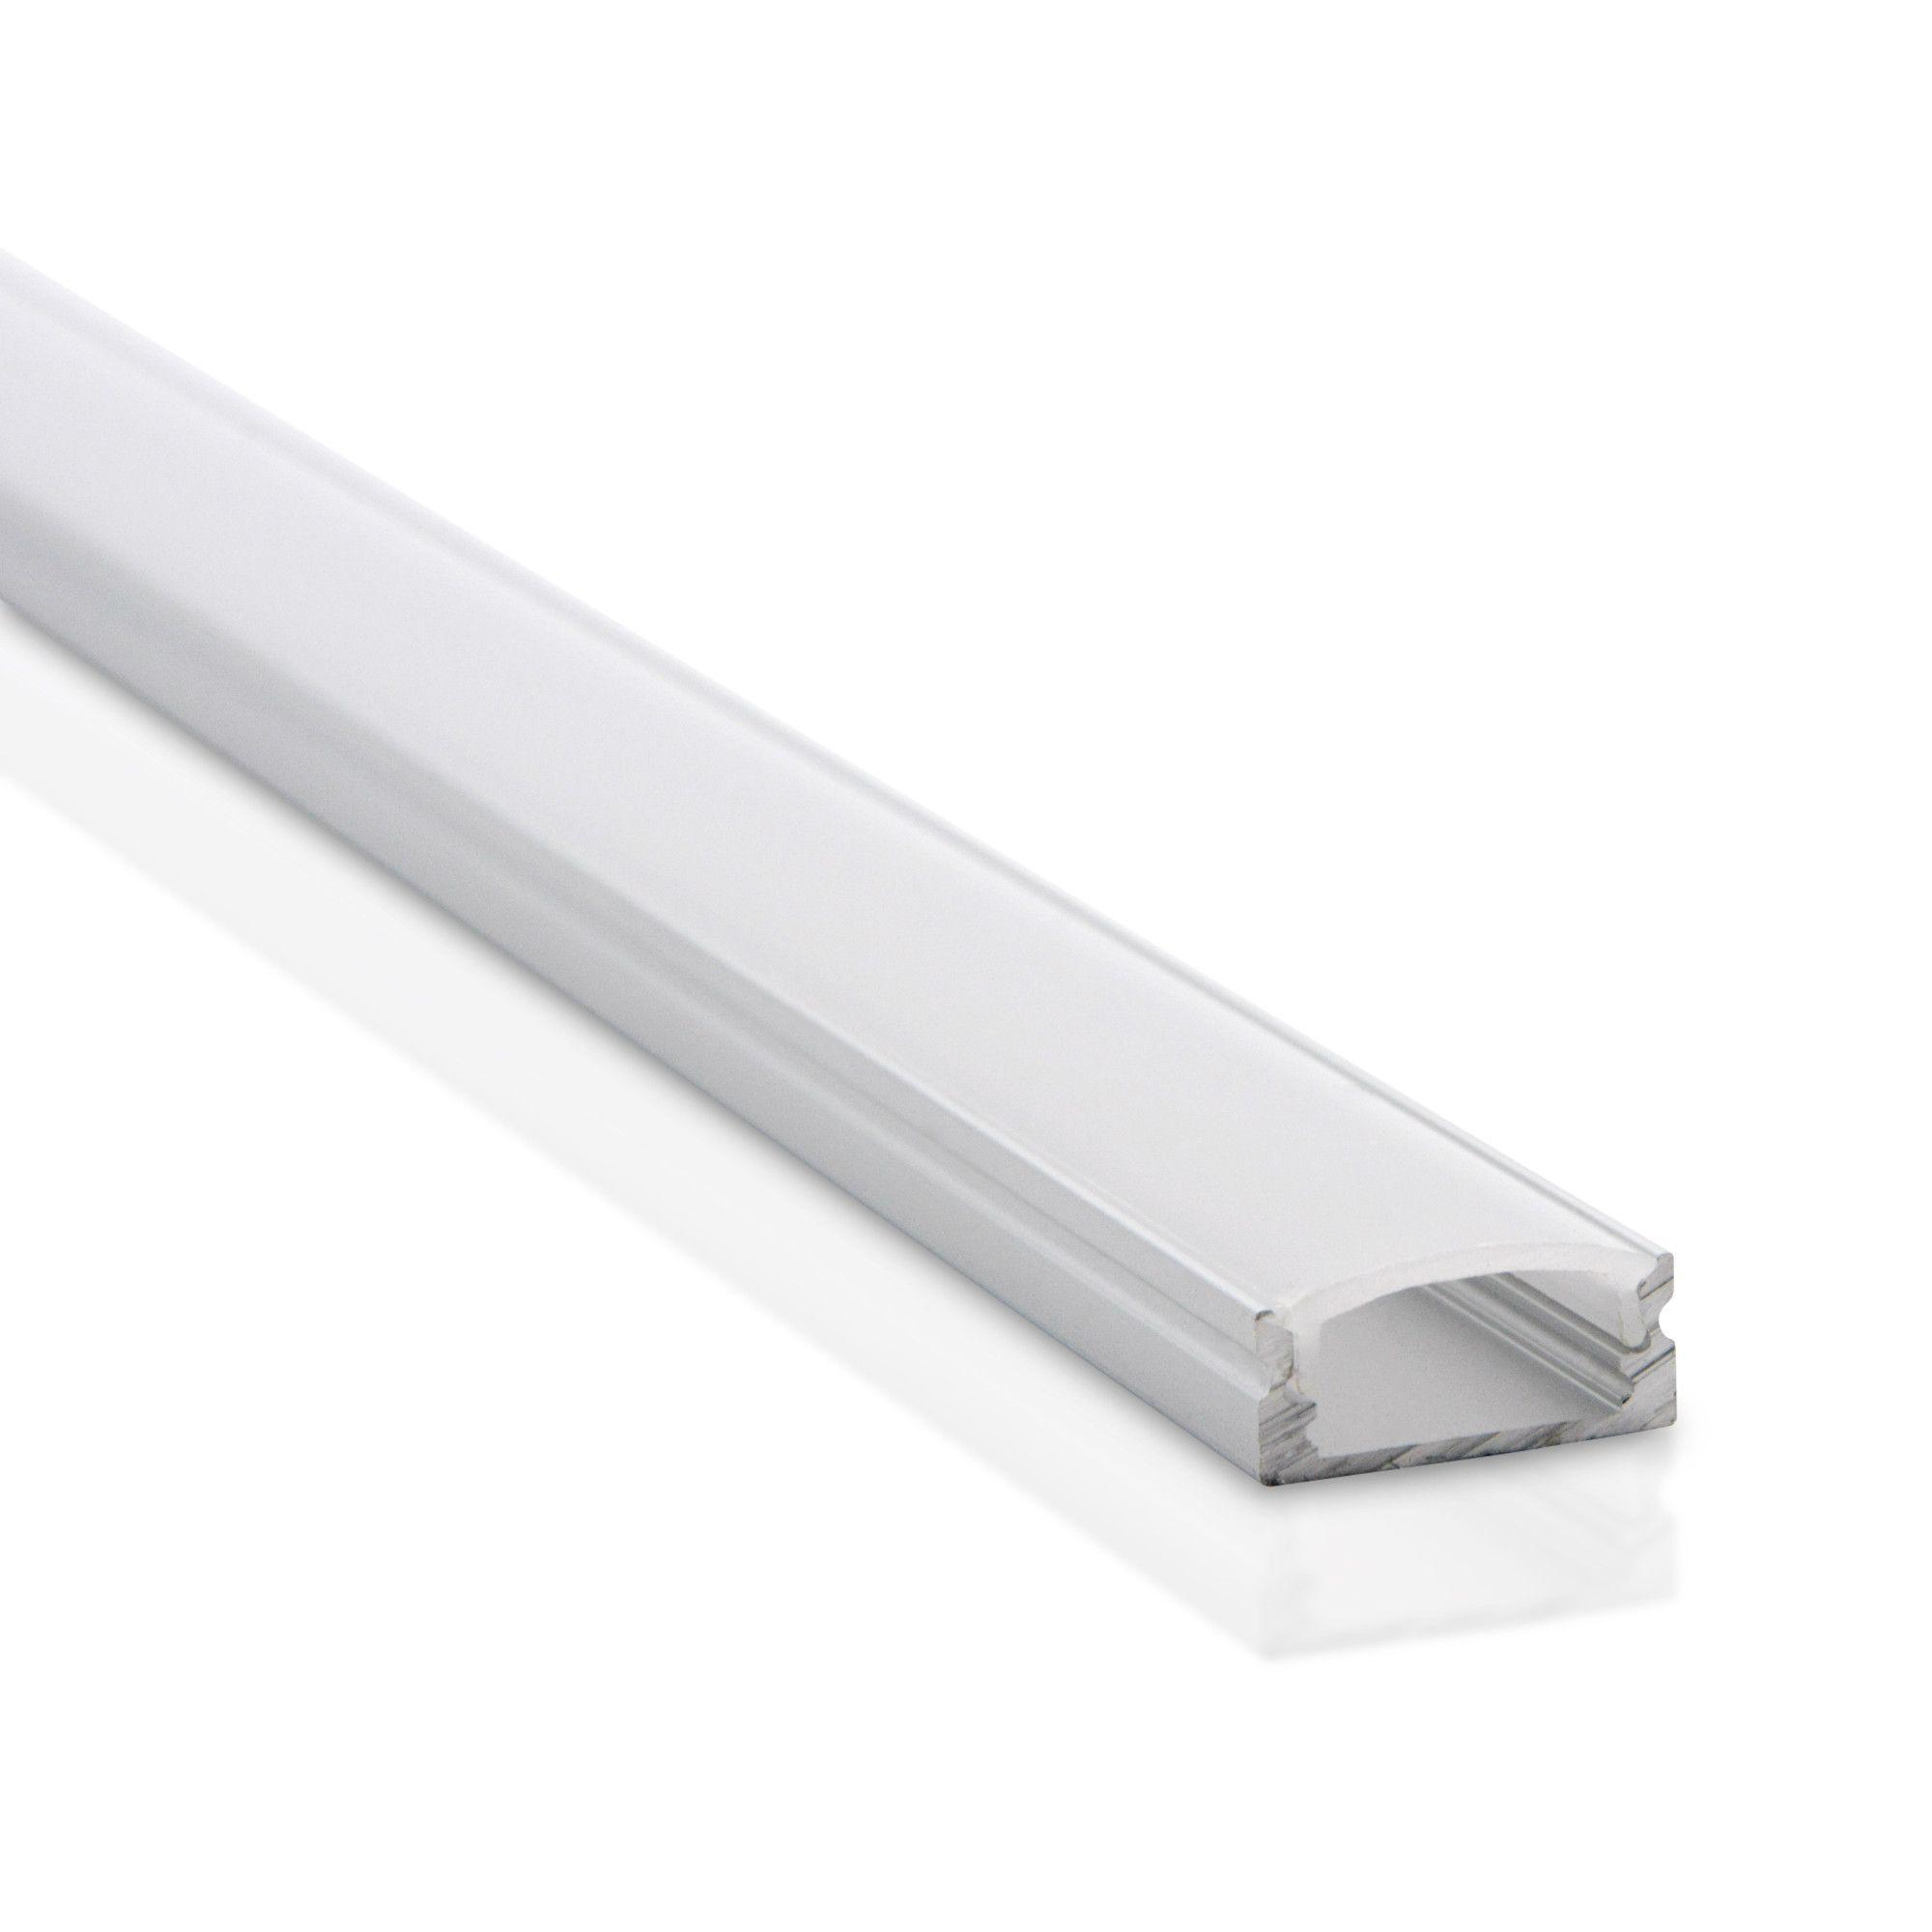 Aluminum Channel System For Led Strip Lights Single Led Strip Lighting Strip Lighting Led Flexible Strip